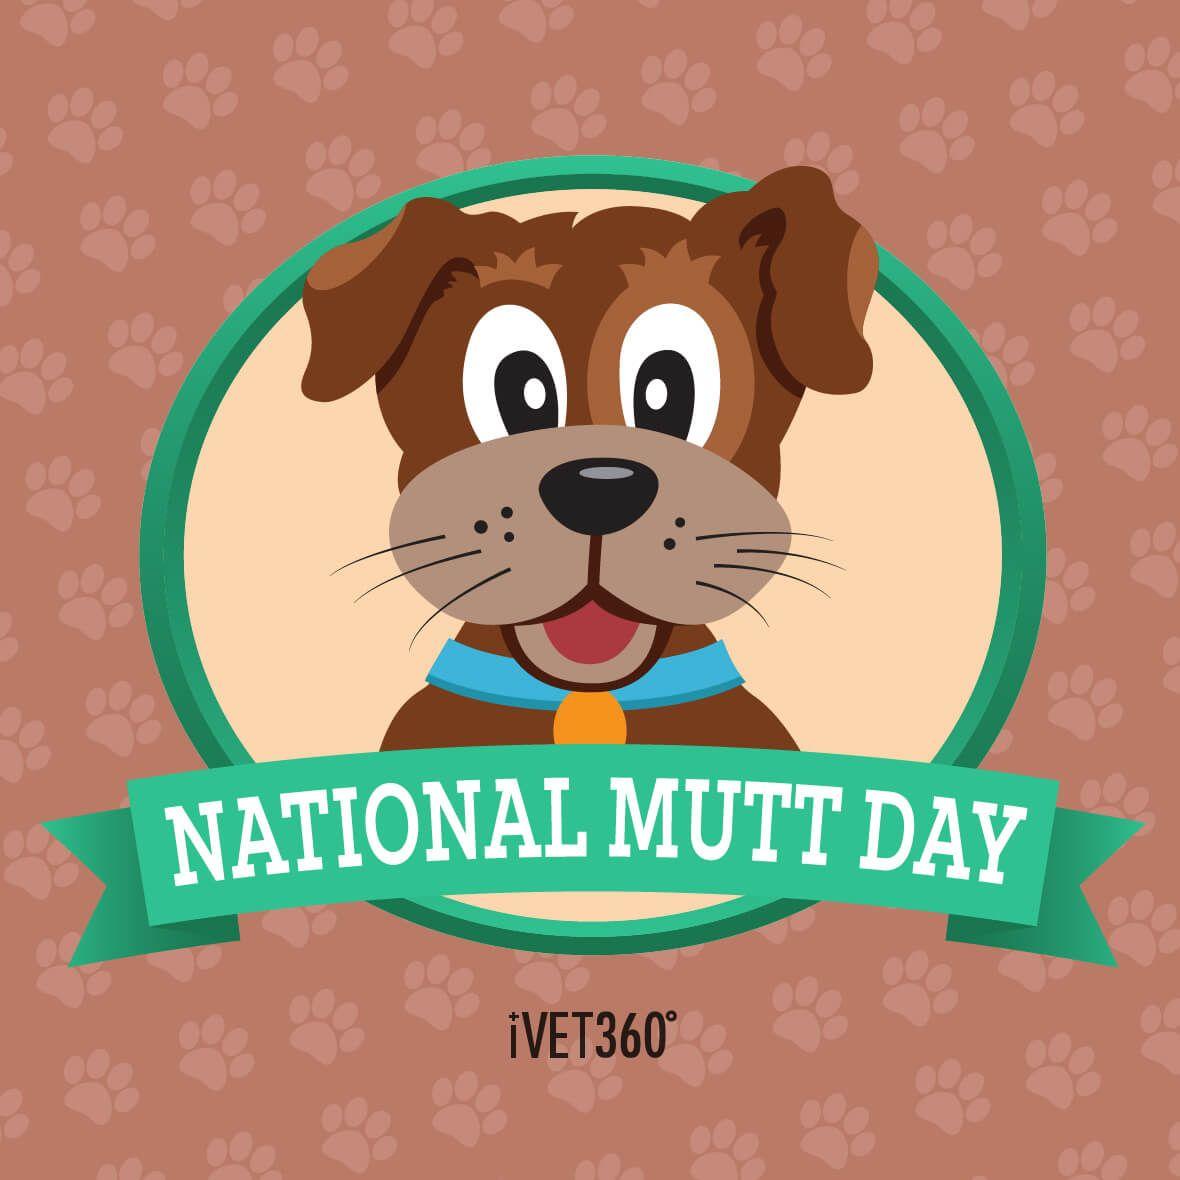 National Mutt Day National mutt day